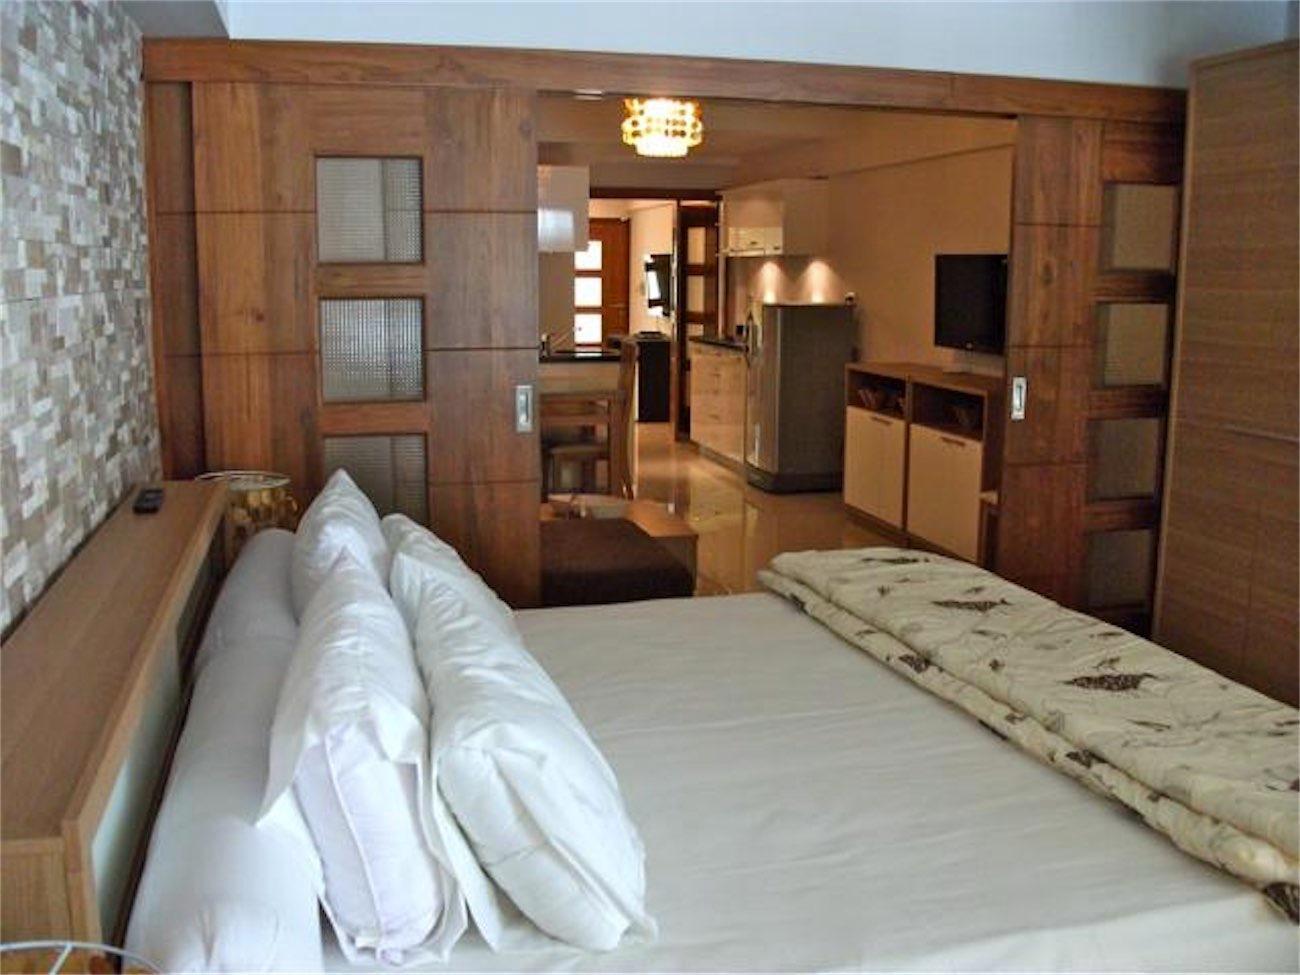 Apartment at 150m from Kata beach! อพาร์ตเมนต์ 1 ห้องนอน 1 ห้องน้ำส่วนตัว ขนาด 65 ตร.ม. – กะตะ